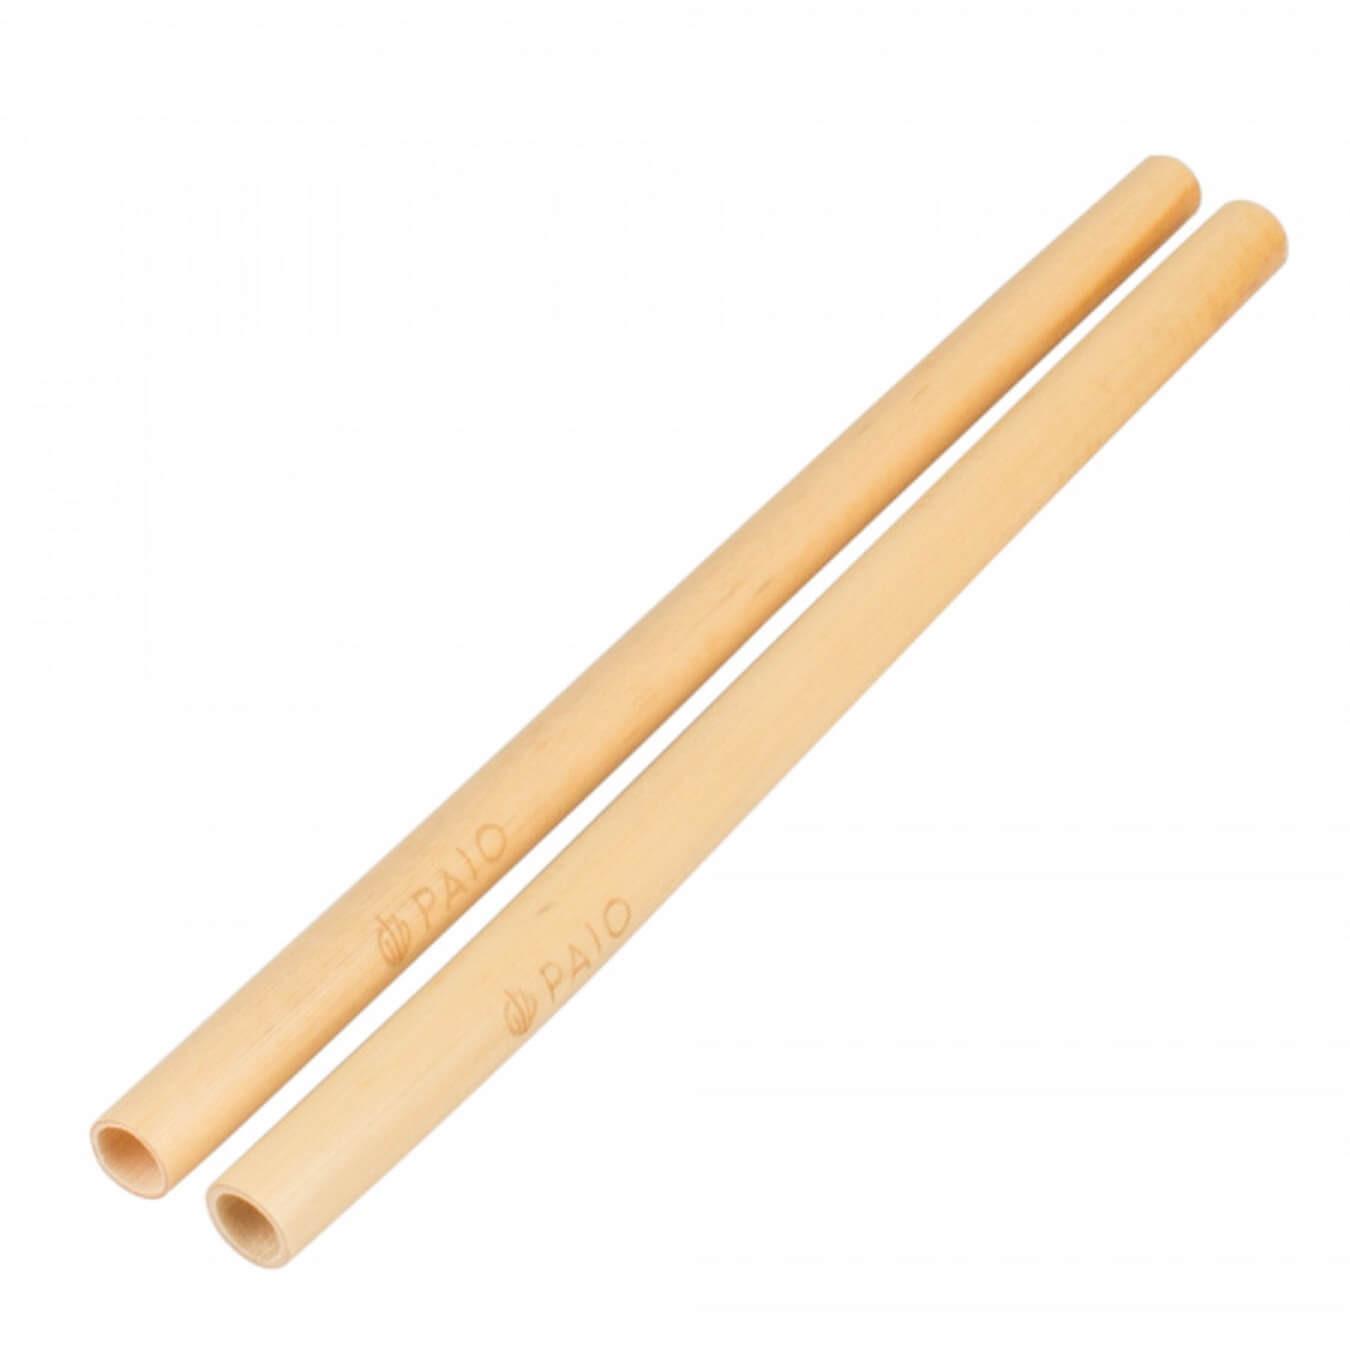 engangs-sugerør-bambus-siv-mismeister.dk